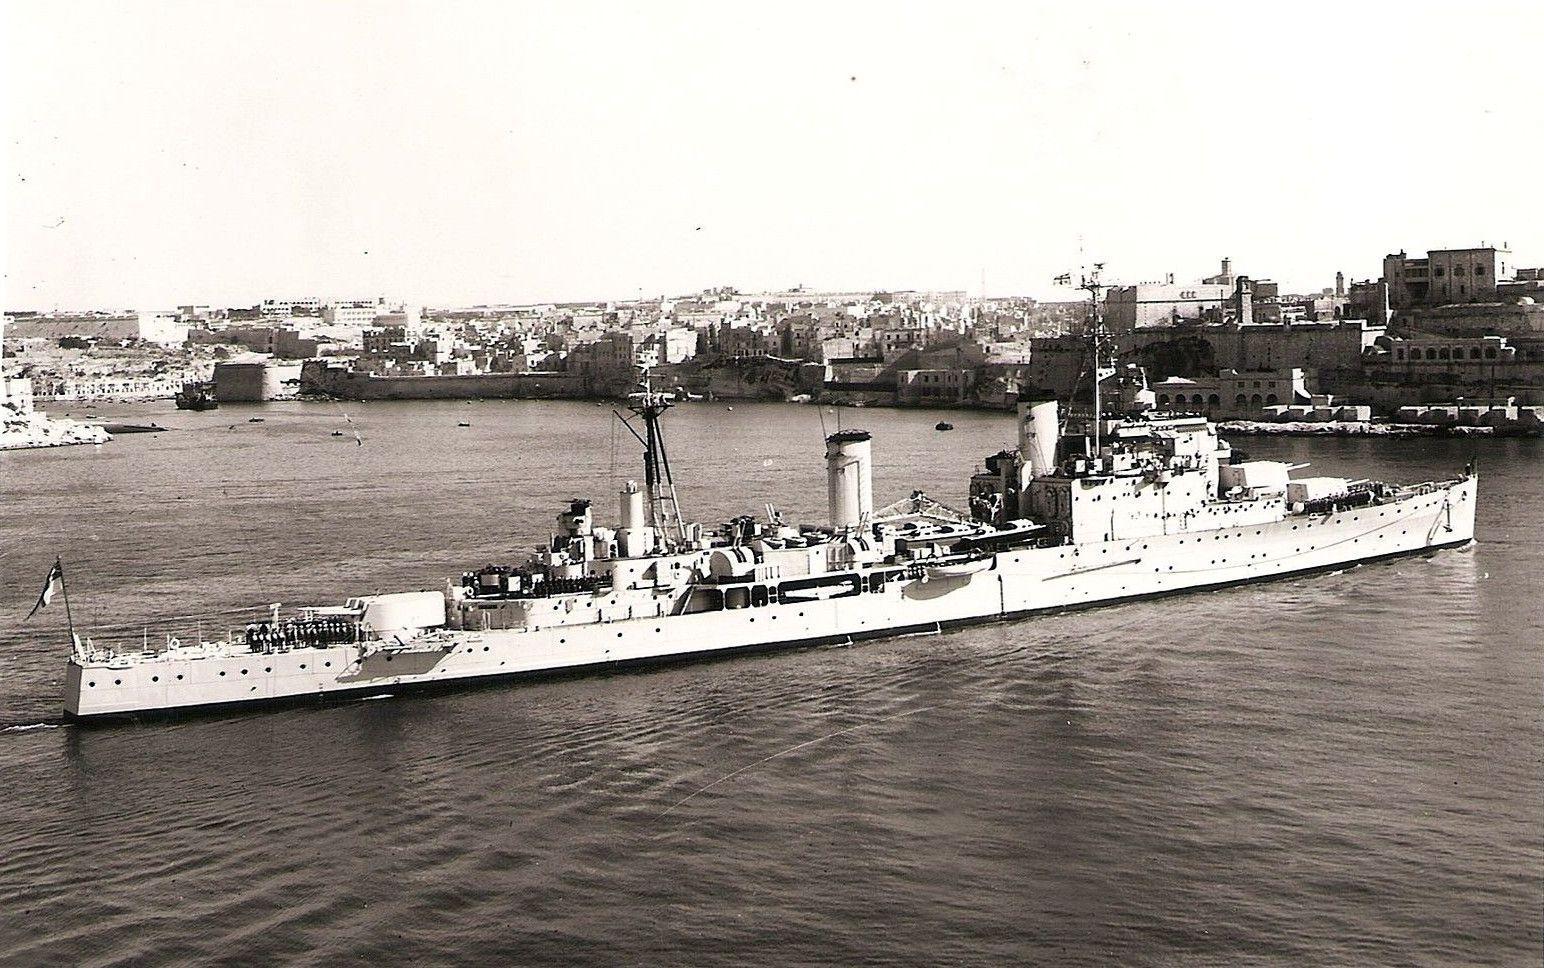 Hms Mauritius C80 Brn Crown Colony Class Light Cruiser At The Grand Harbor Malta In 1957 Google Image 07 20 In 2020 Royal Navy Ships Royal Navy Warship